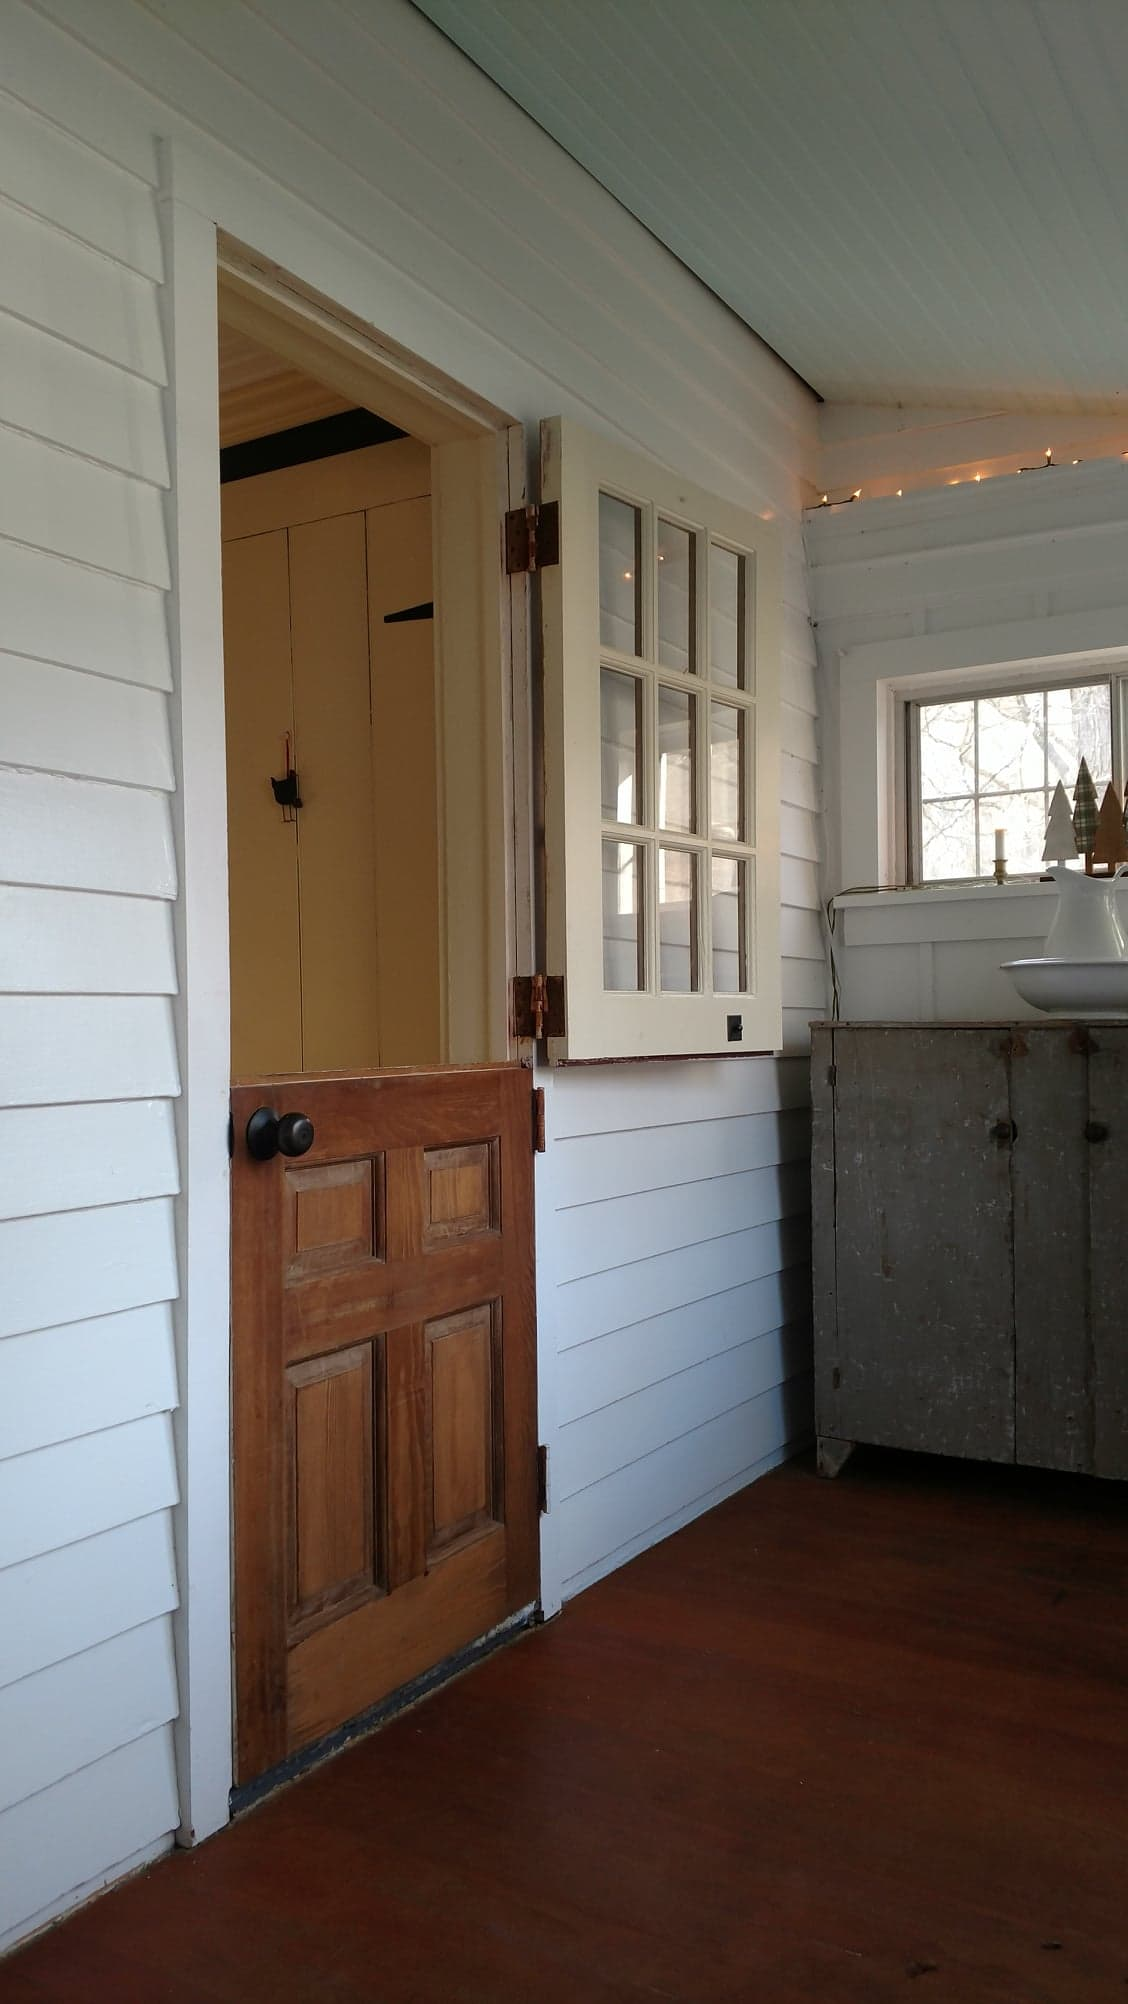 Front Kitchen - Exterior View